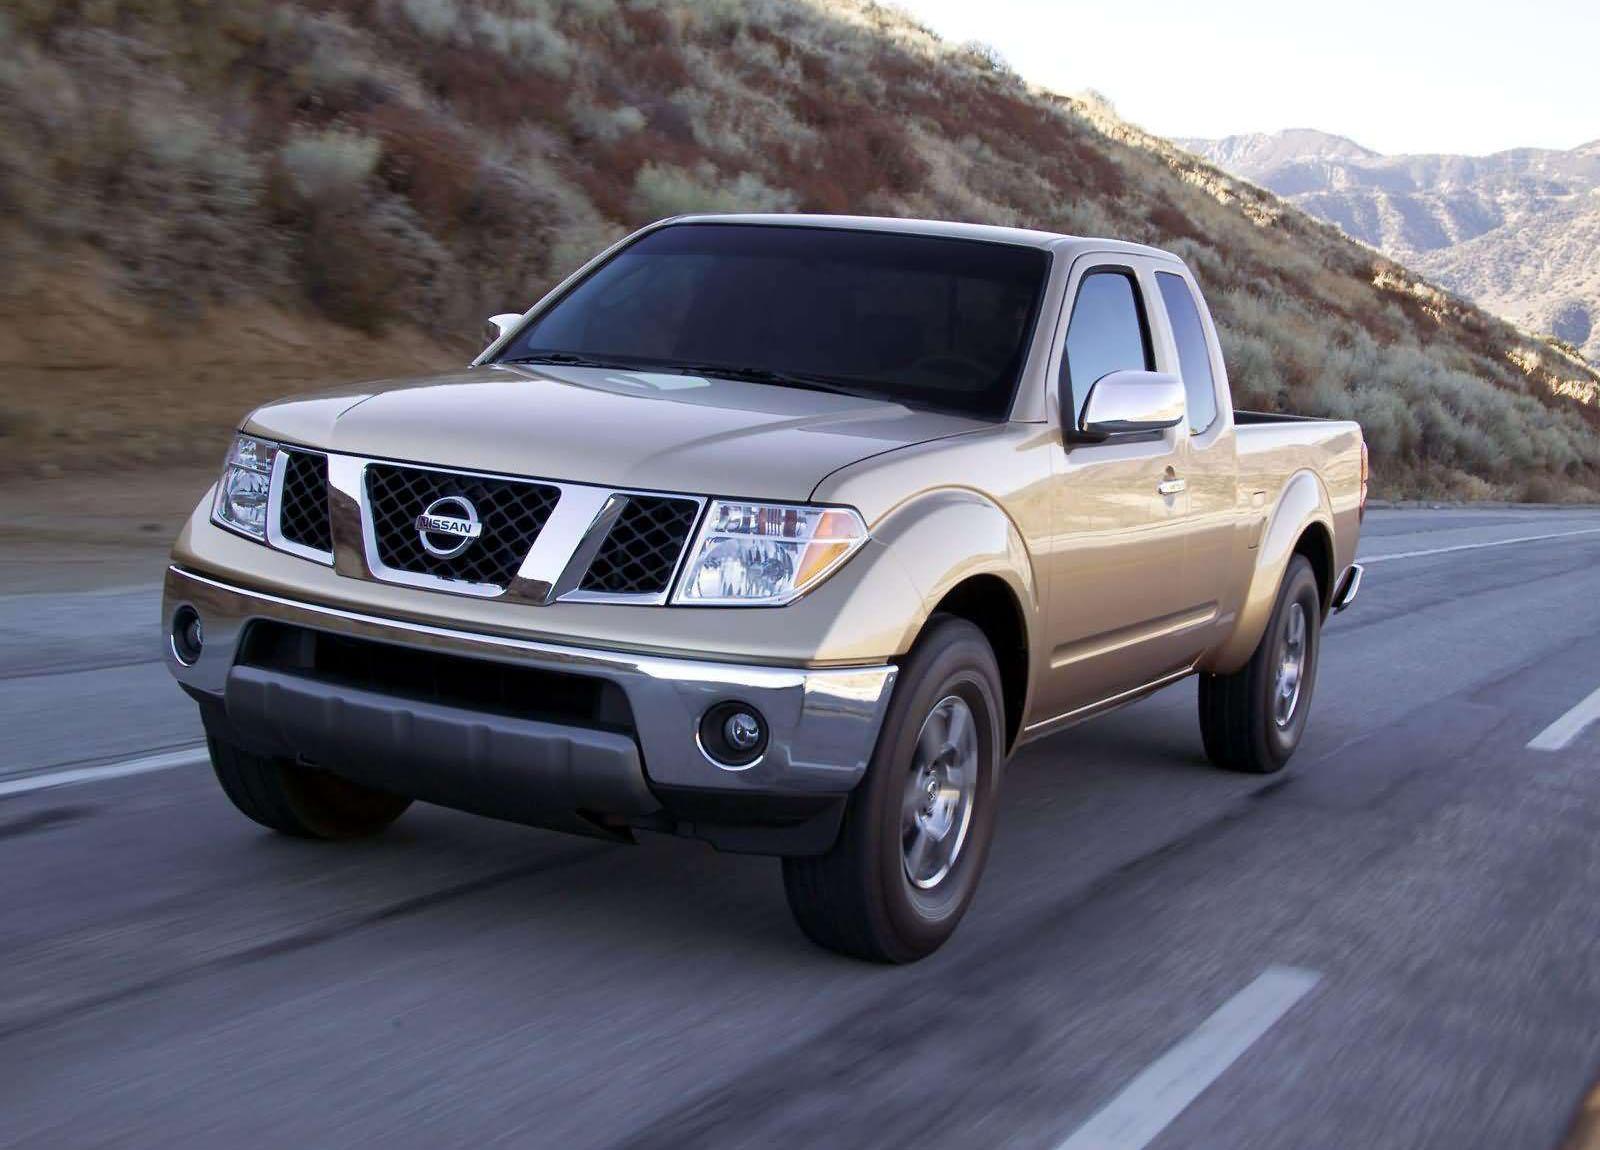 Nissan Frontier photo #1